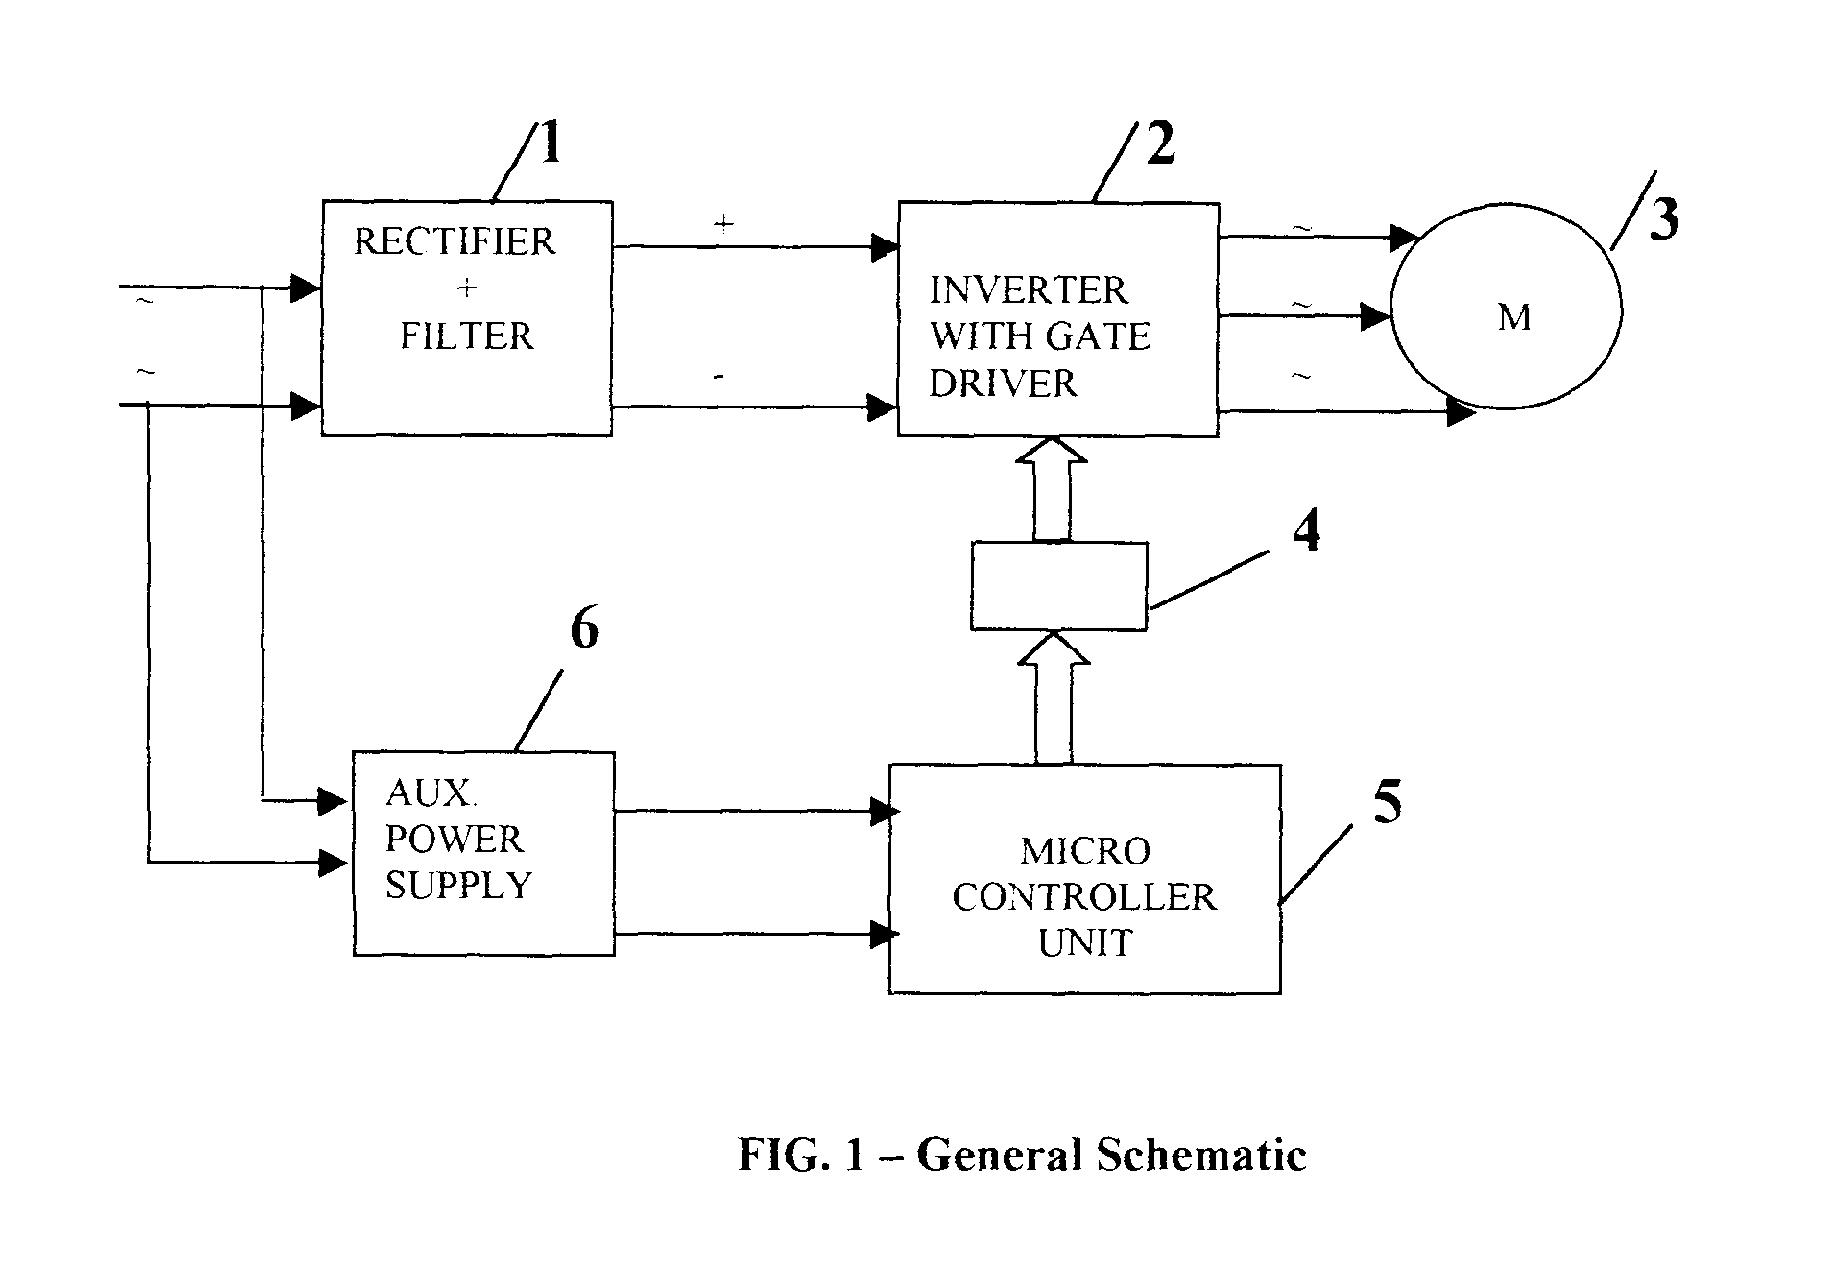 hight resolution of vacon vfd wiring diagram schematic basic wiring automotive max wolf vfd wiring vfd control diagram